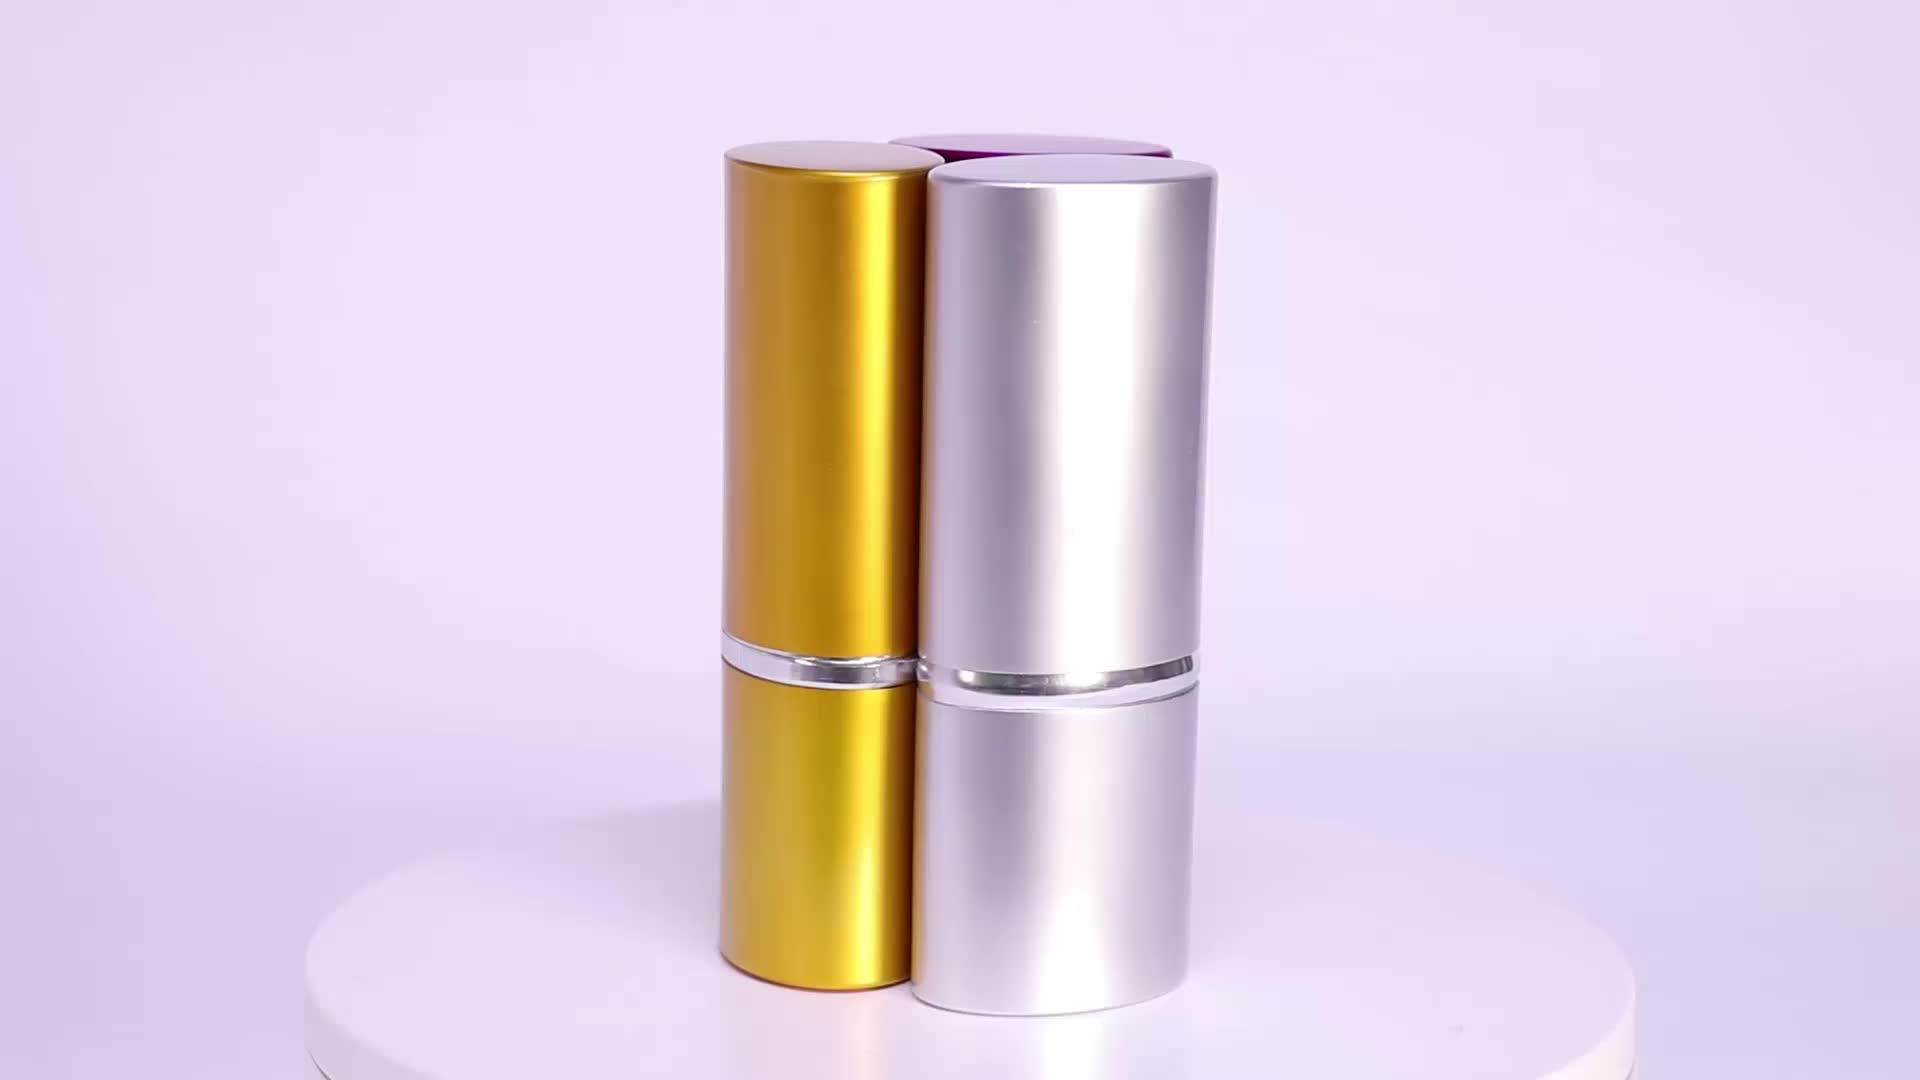 OEMPROMO Aluminum Cylinder gold color 4pcs Beauty pedicure Manicure set